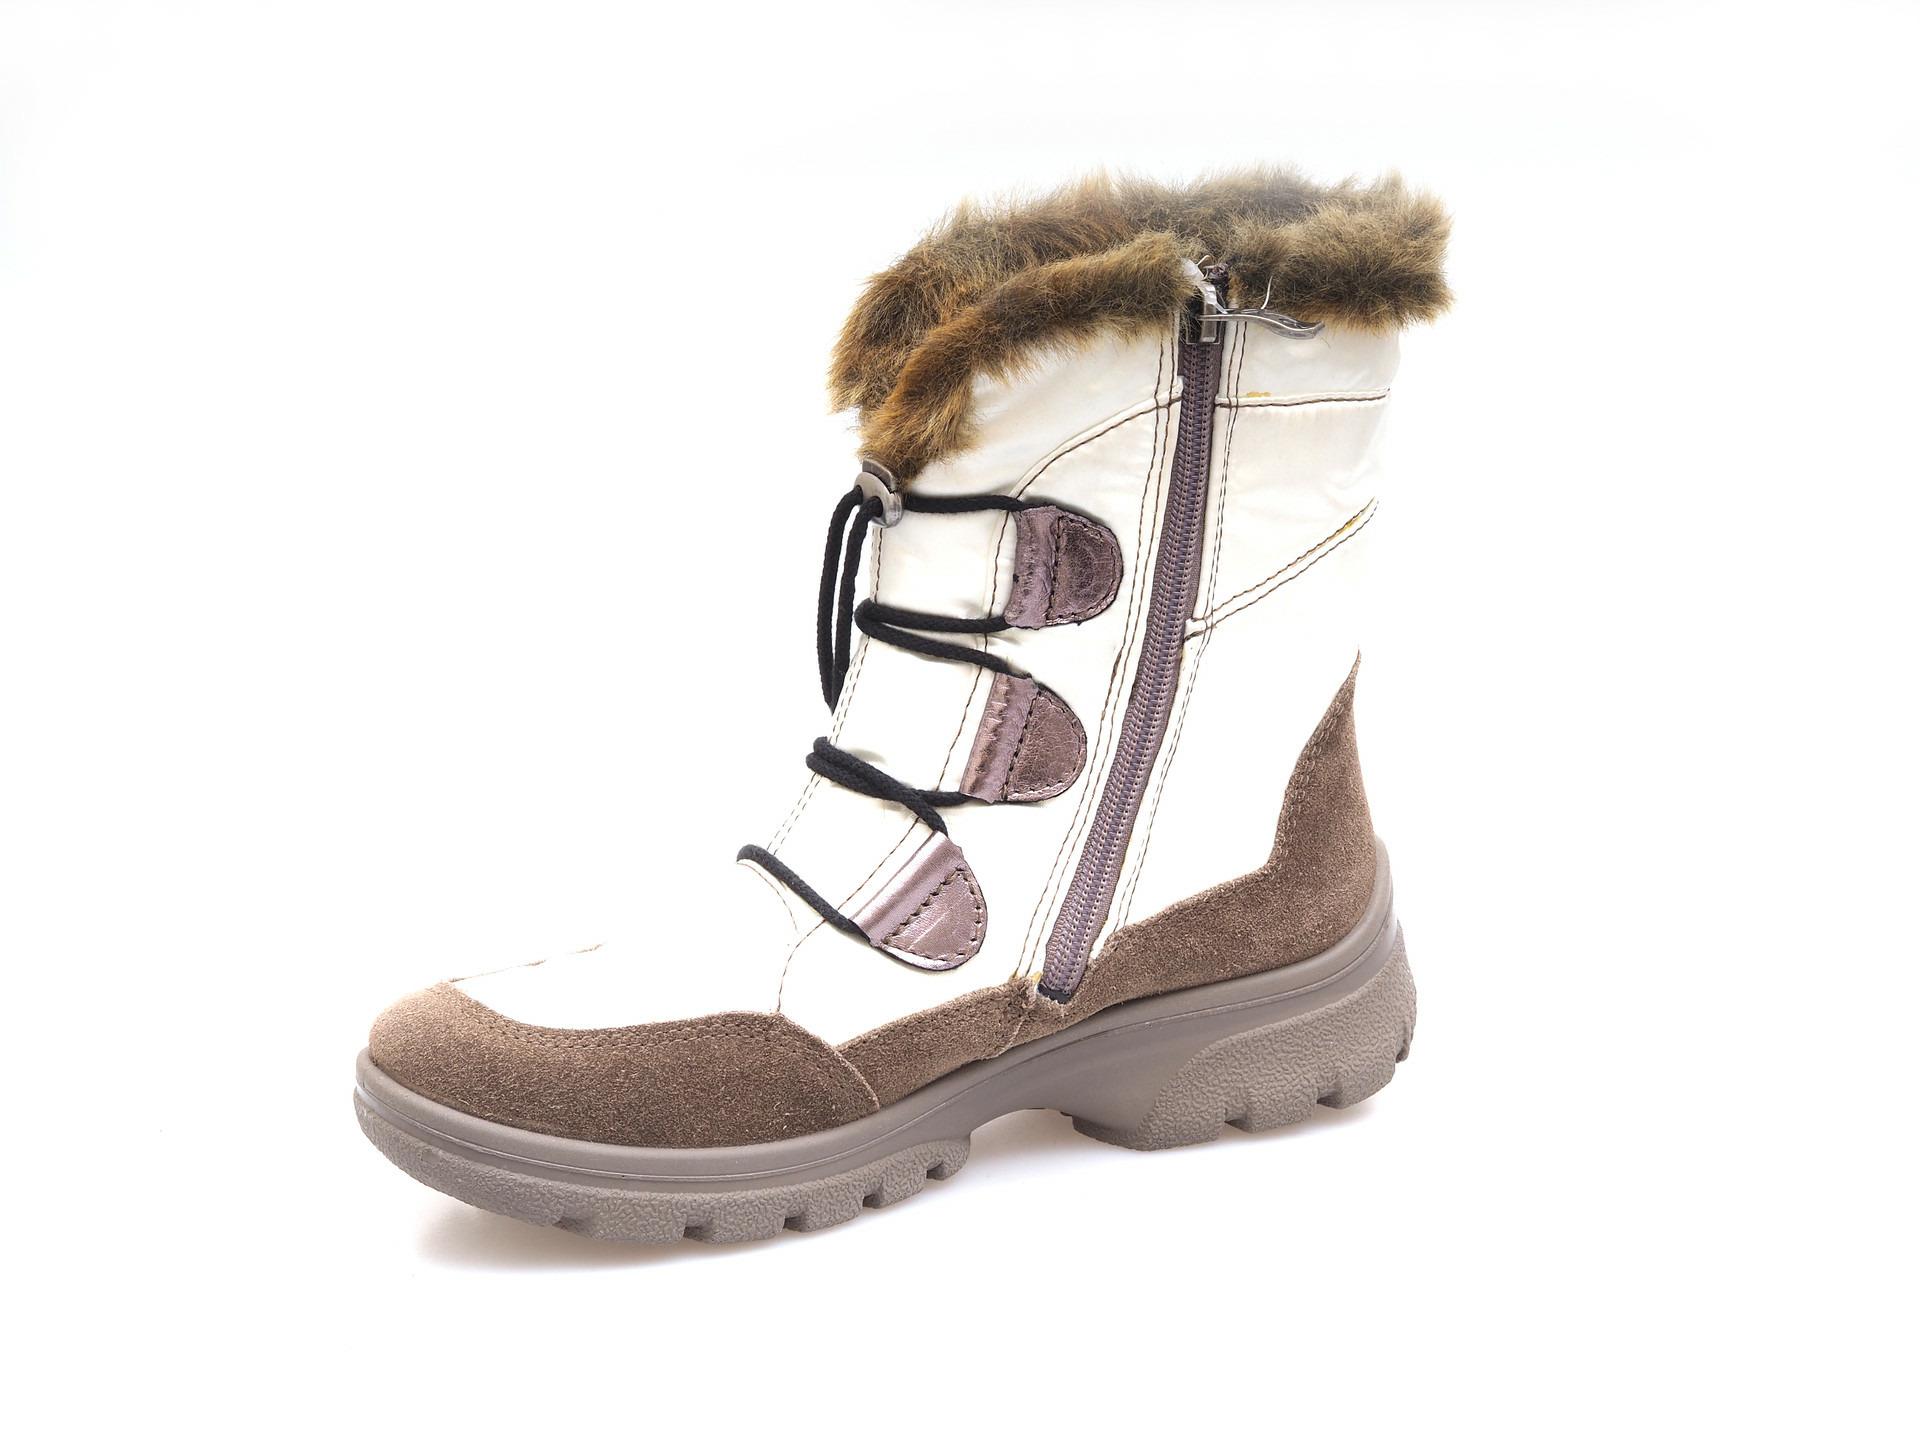 Soňa - Dámska obuv - Kotníčky - Gore-texová dámska obuv značky Ara 61a889e0161